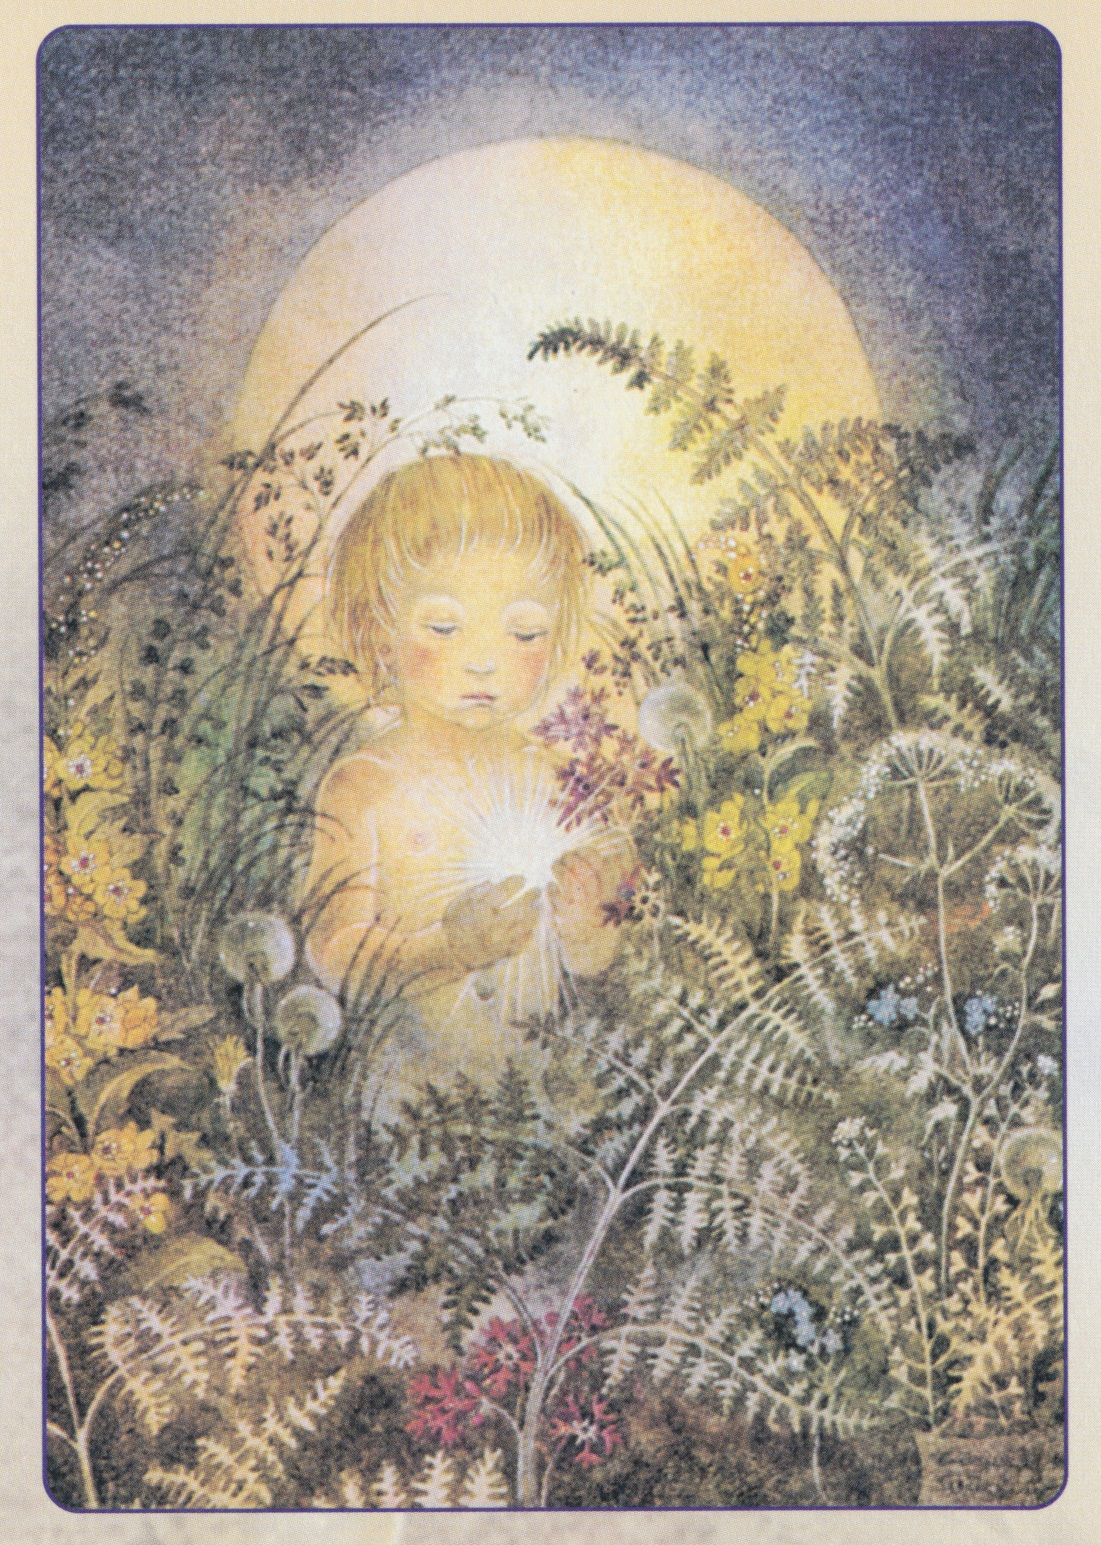 The Sunchild